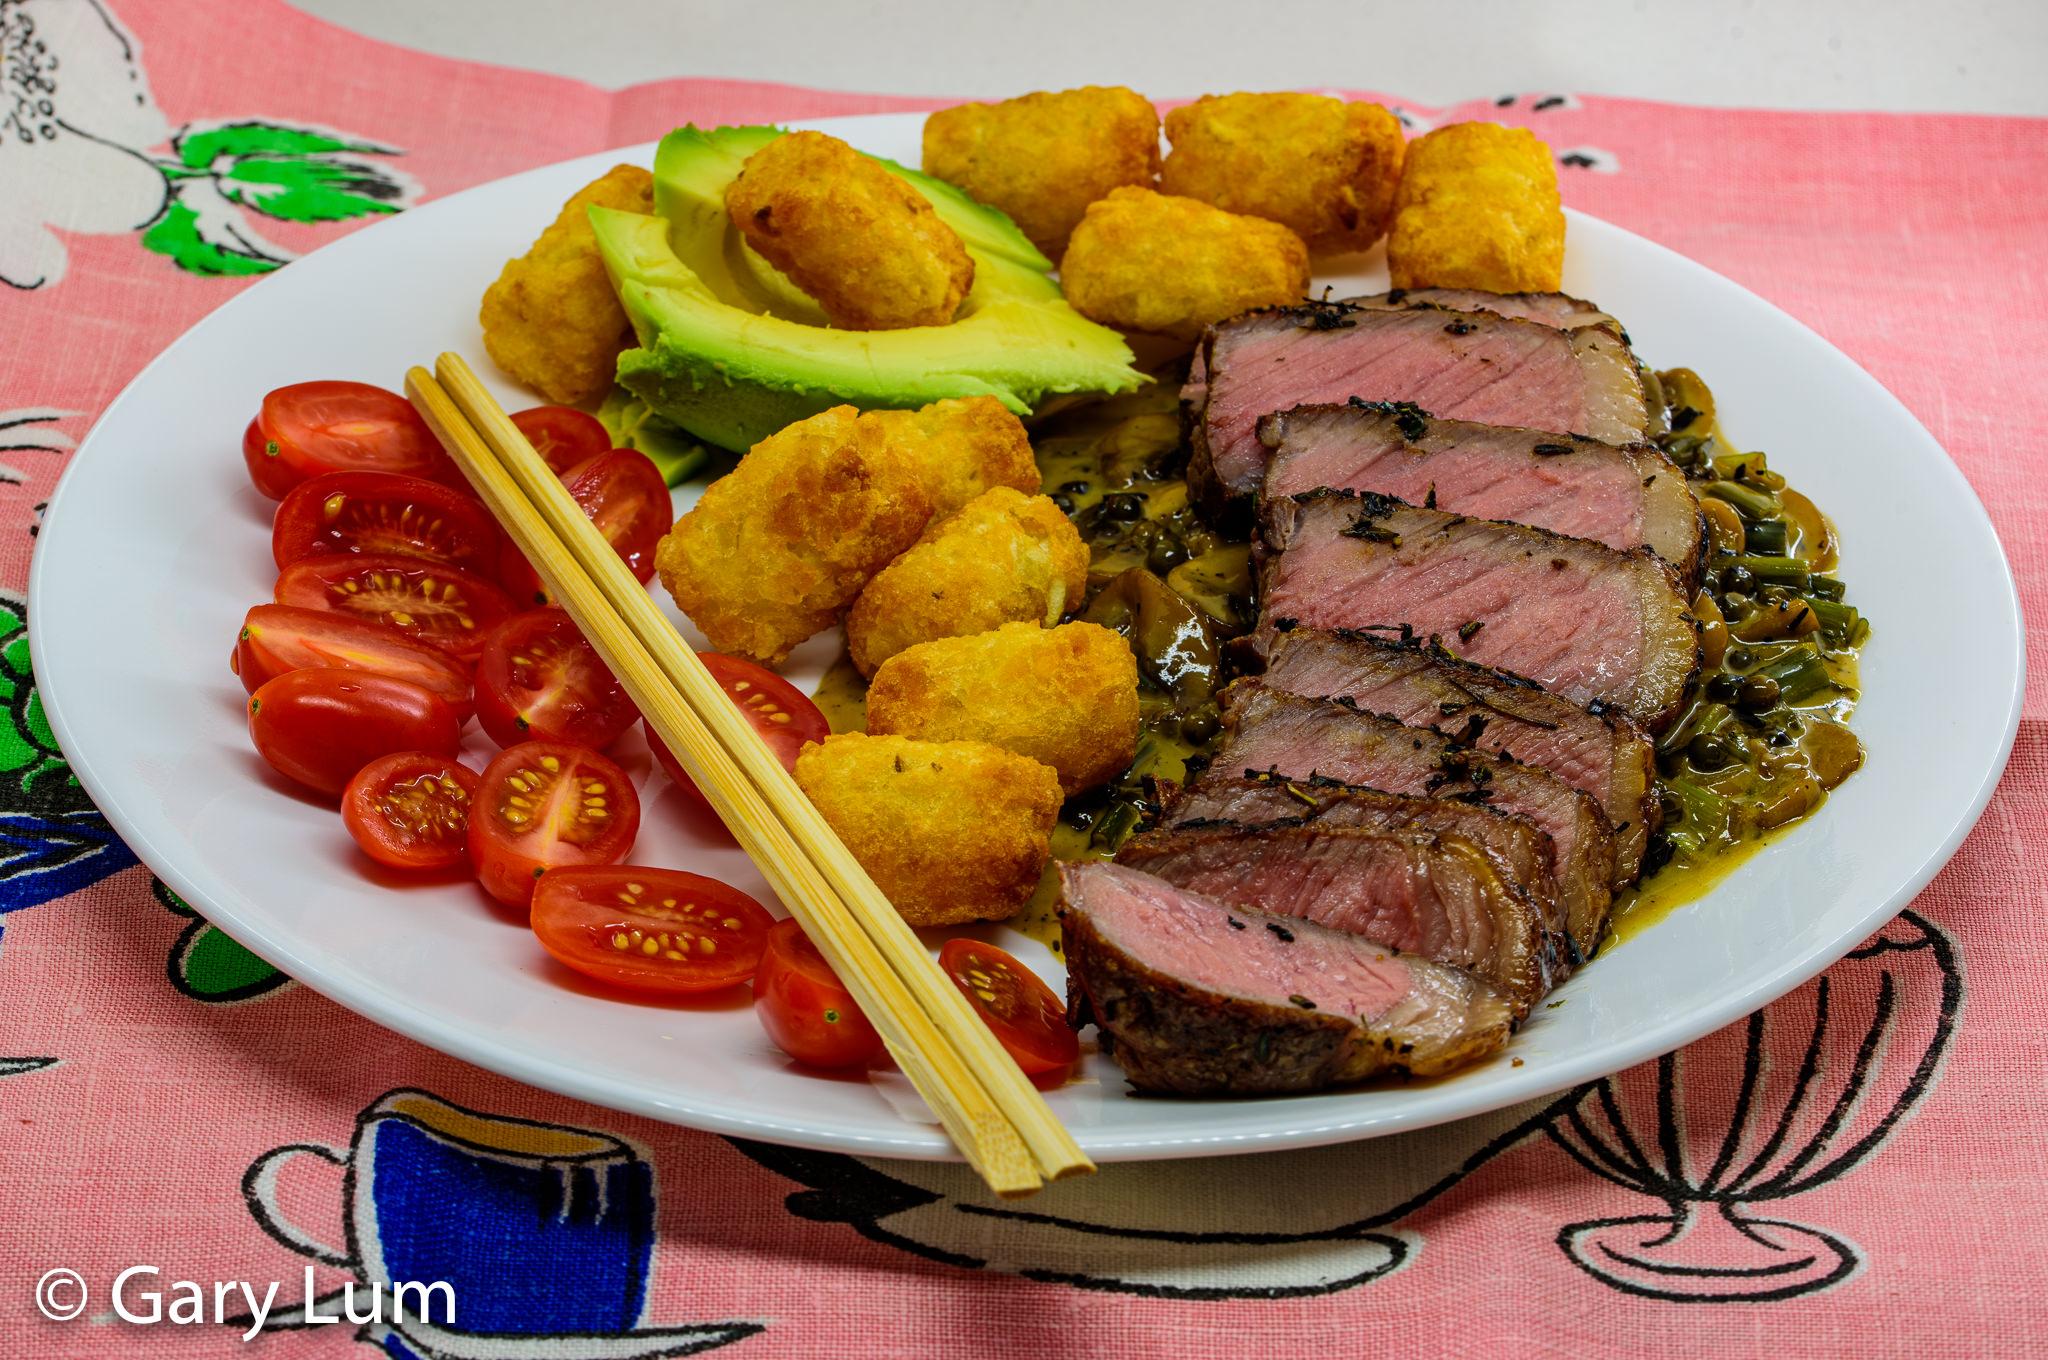 Reverse seared Porterhouse steak with green peppercorn and mushroom sauce served with potato gems, avocado, and cherry tomatoes. Gary Lum.